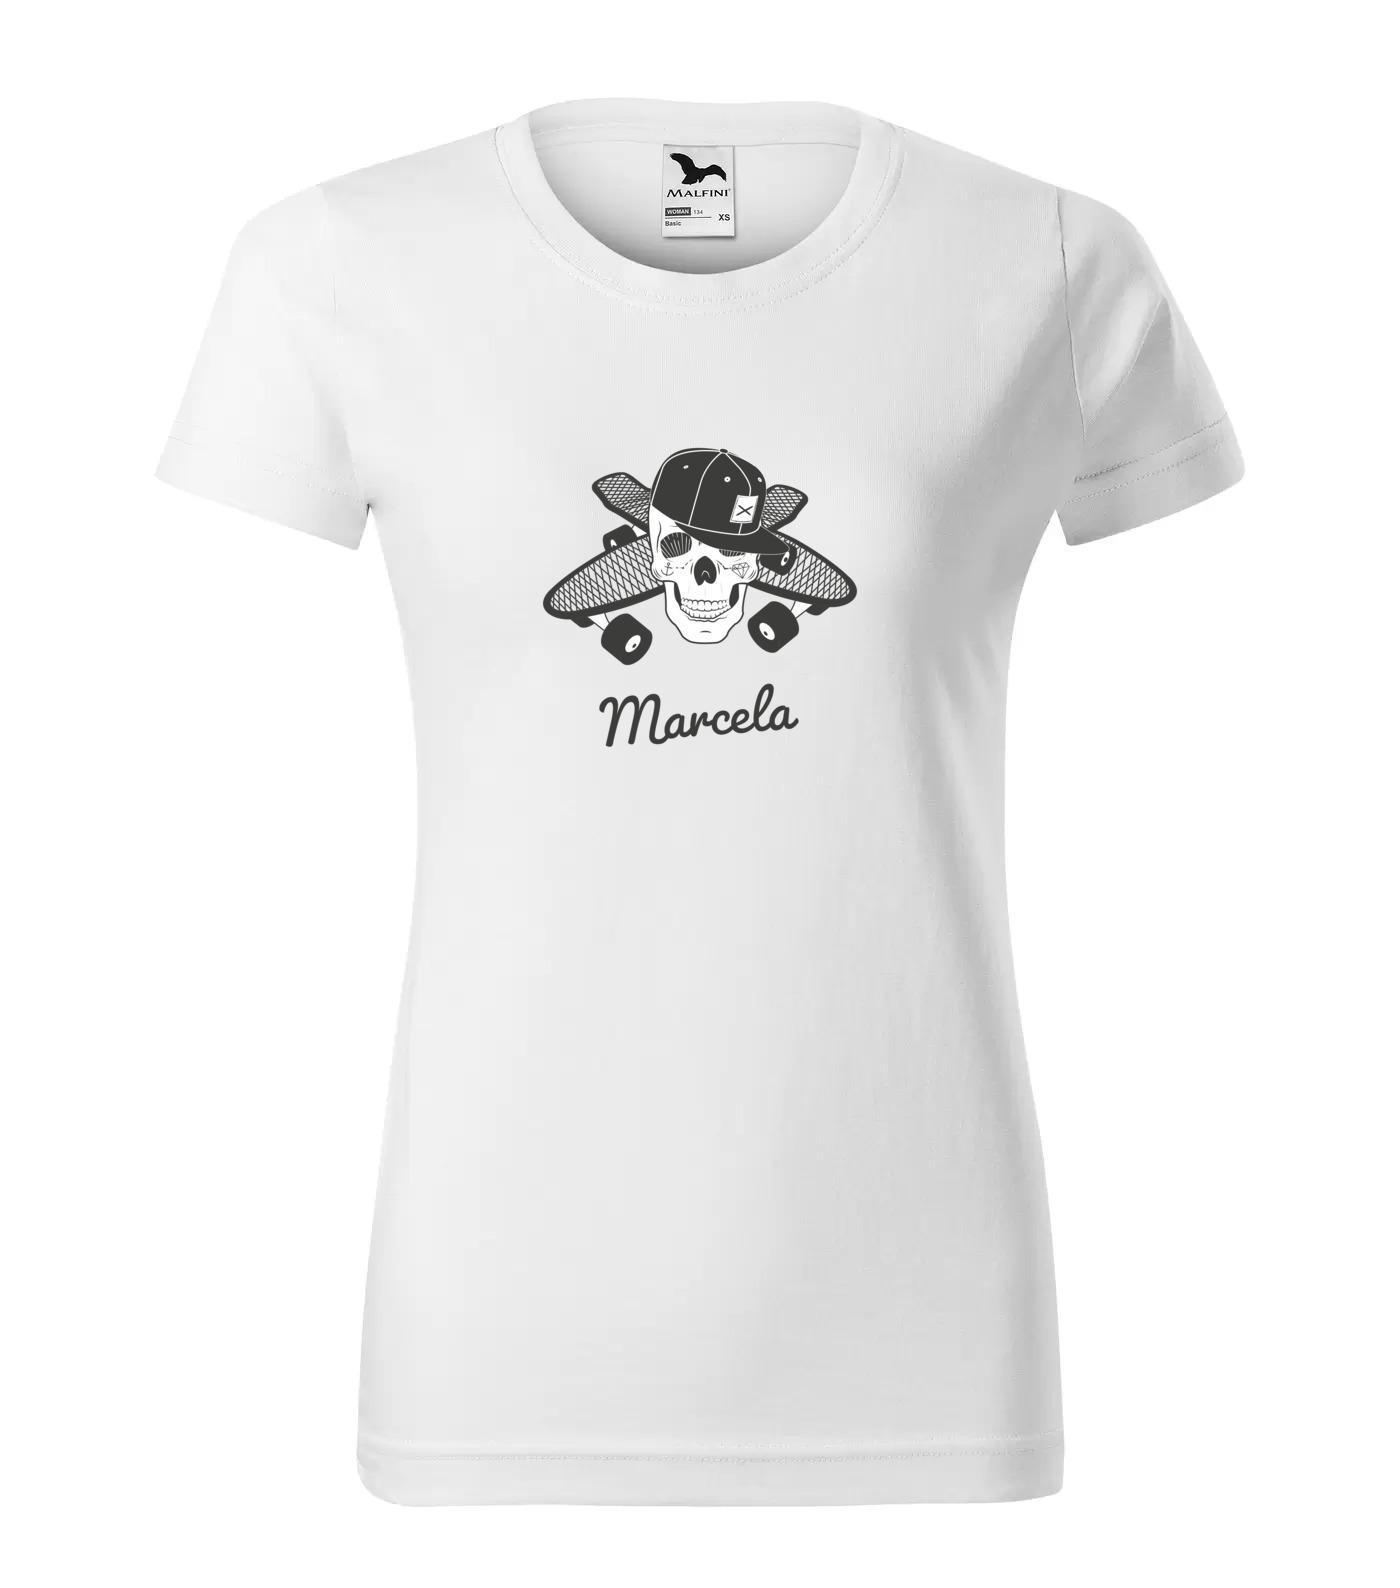 Tričko Skejťačka Marcela